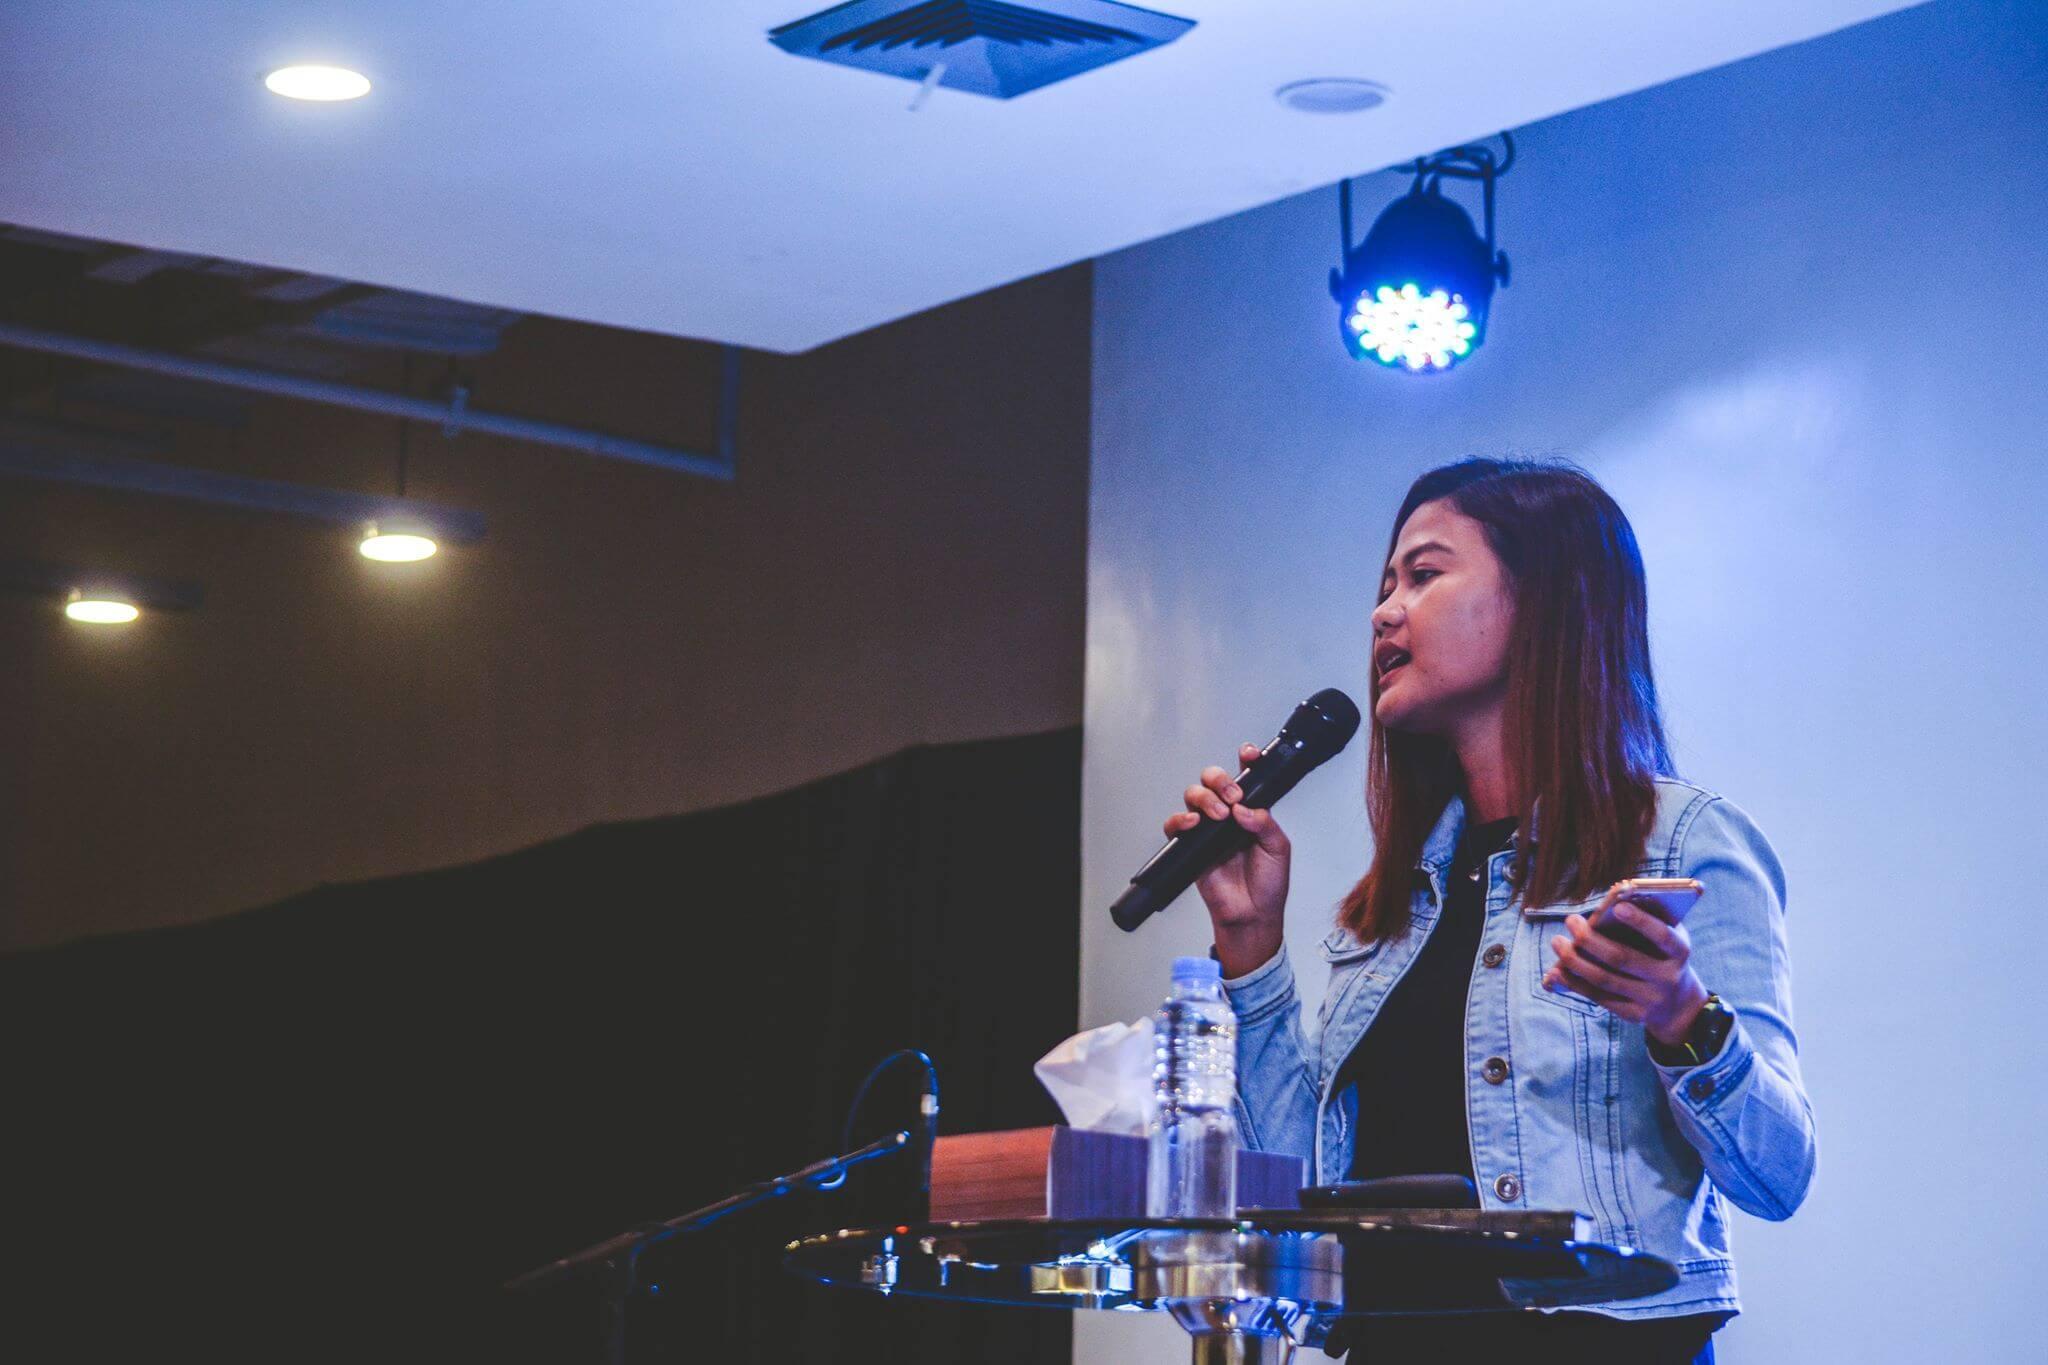 chanteuse article weeprep